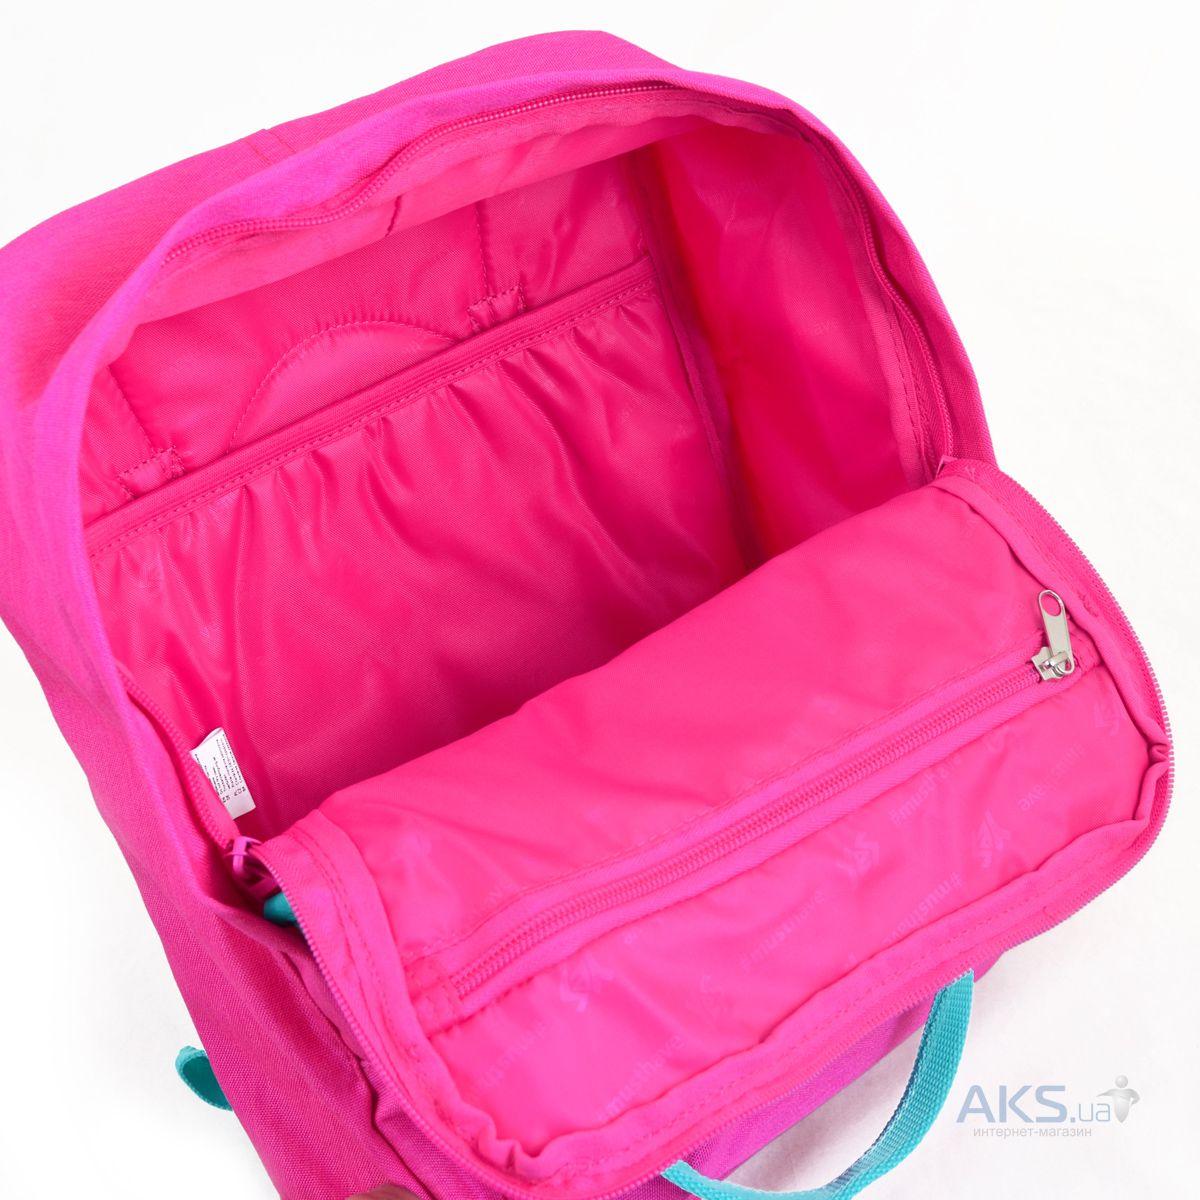 70358d44d777 Рюкзак YES Рюкзак подростковый ST-24 Hot pink (555587) Hot pink ...